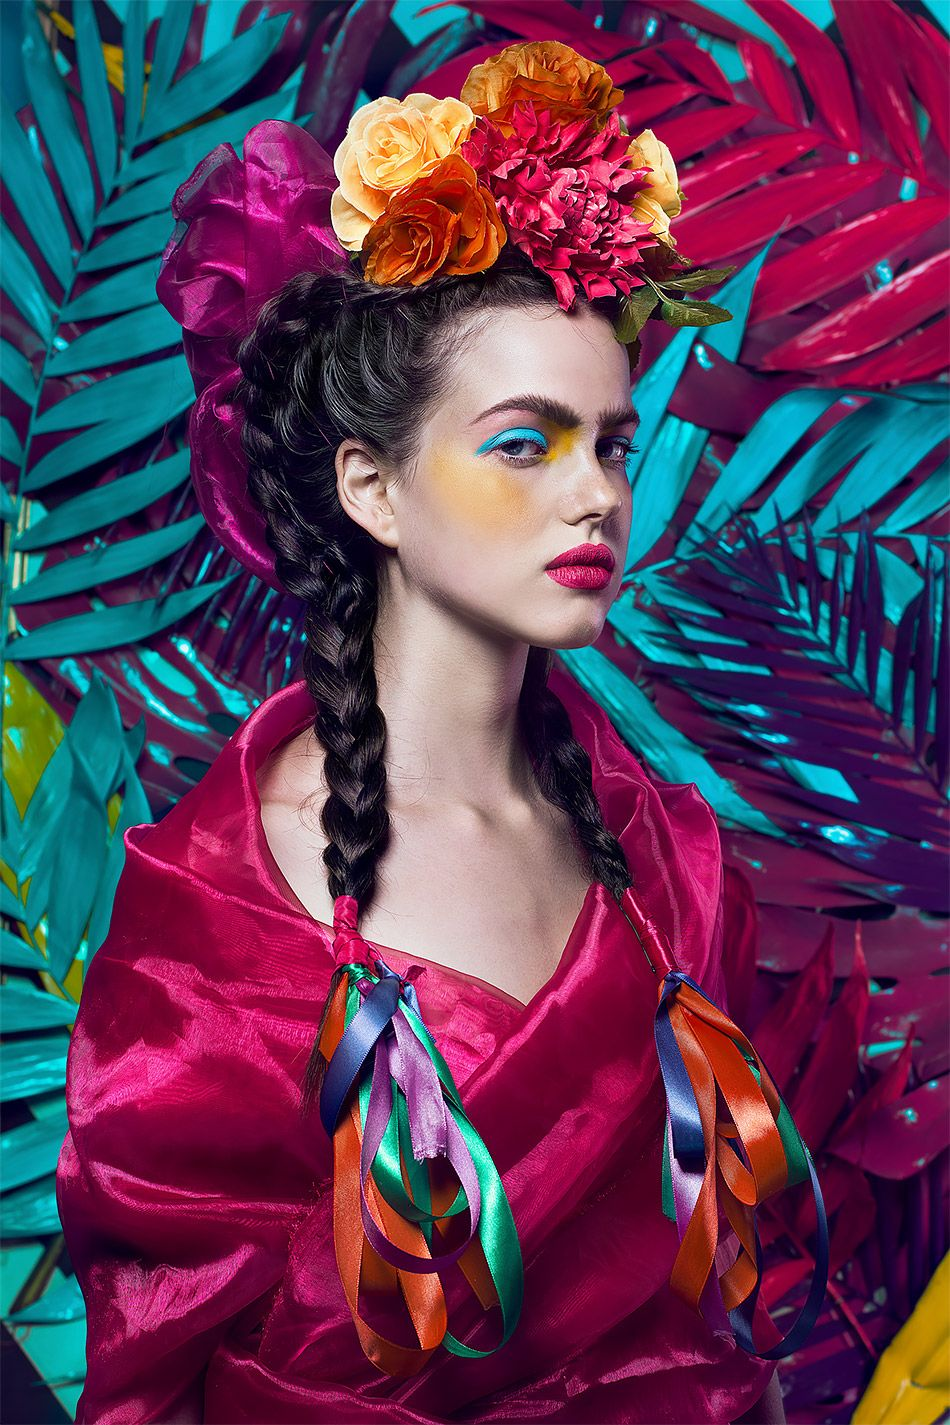 Creative Fashion Photography By Fernando Rodriguez